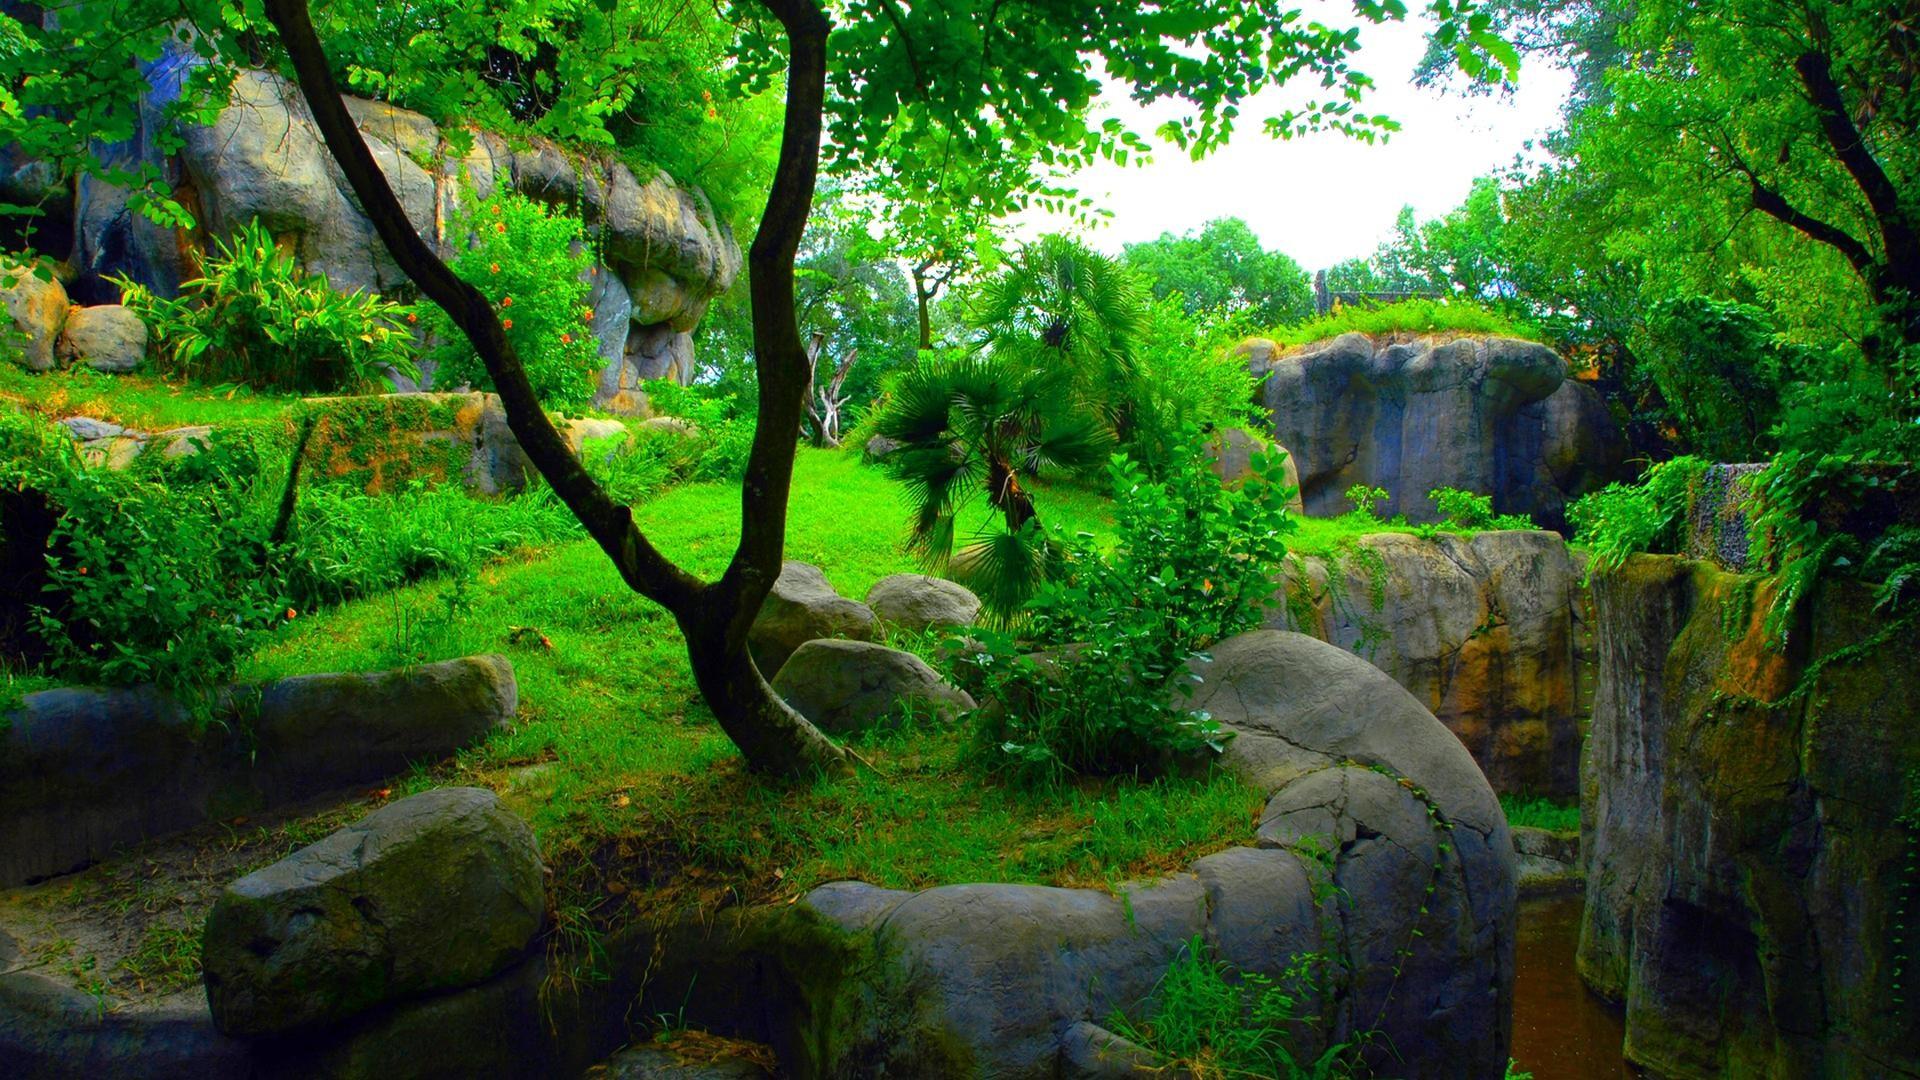 green-abstract-1080p-skyrim-wallpaper– HD Widescreen .